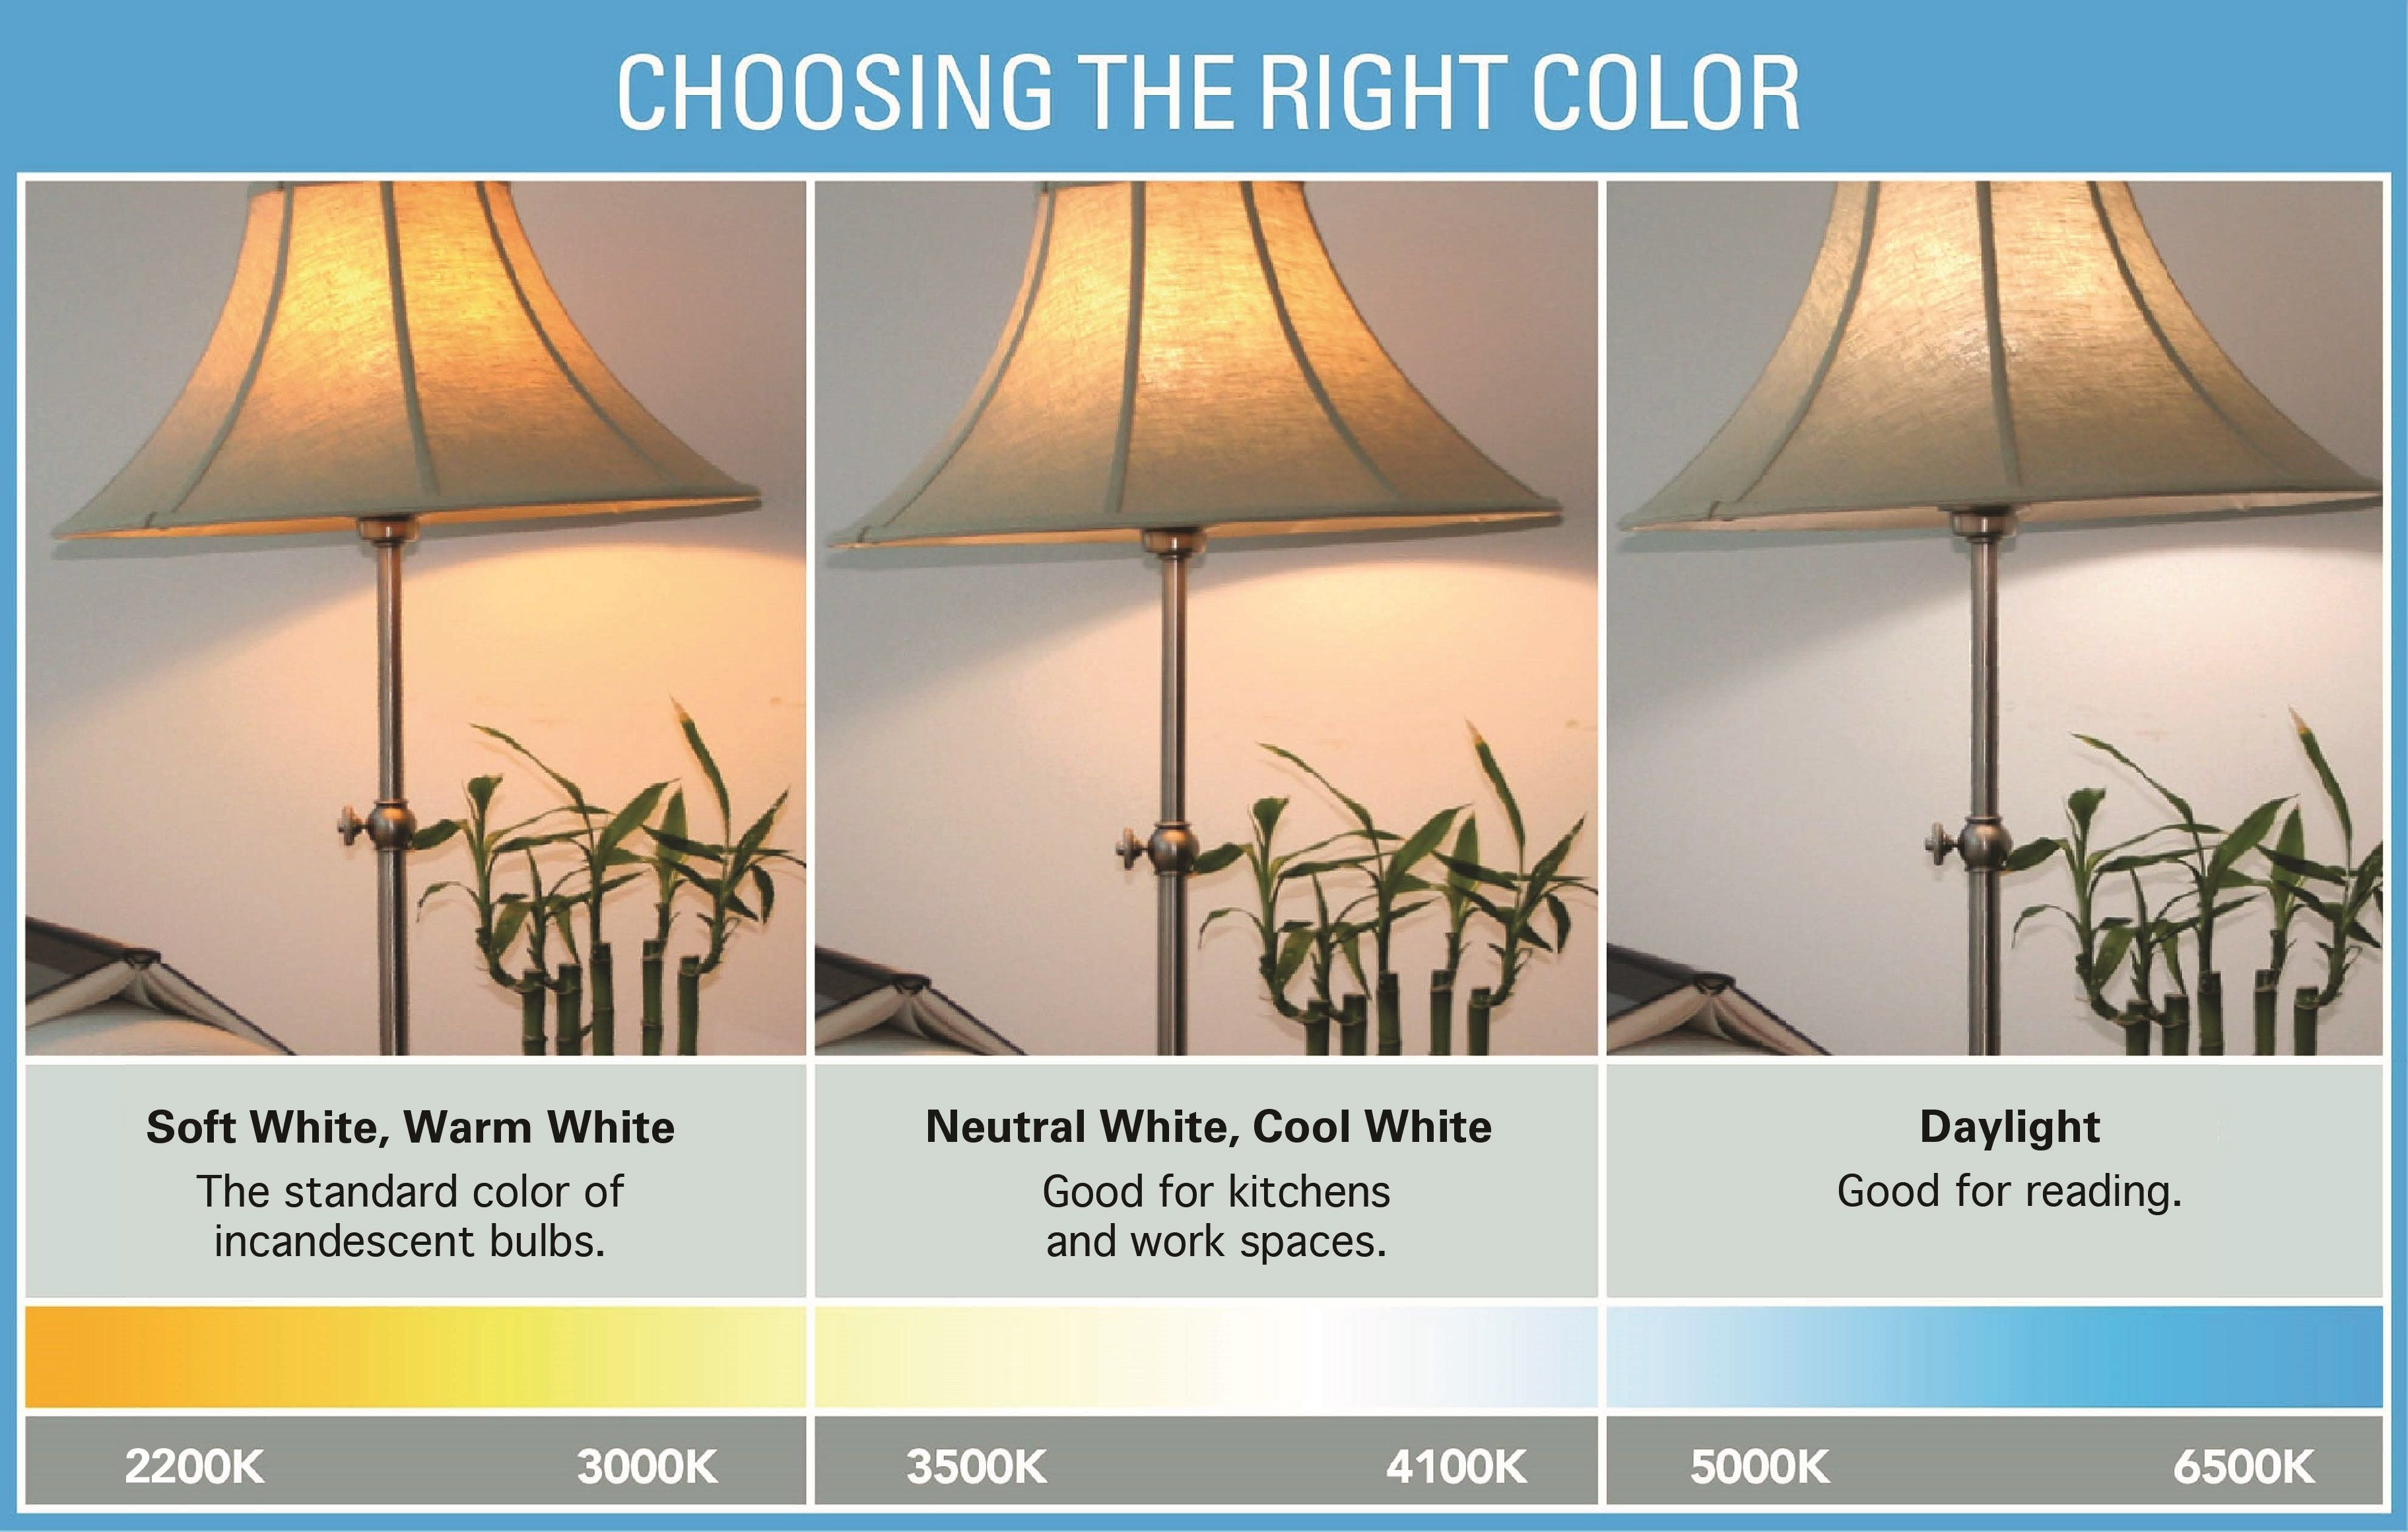 Kitchen Light Bulb Color Temperature White Light Bulbs Choosing Light Bulbs Bulb